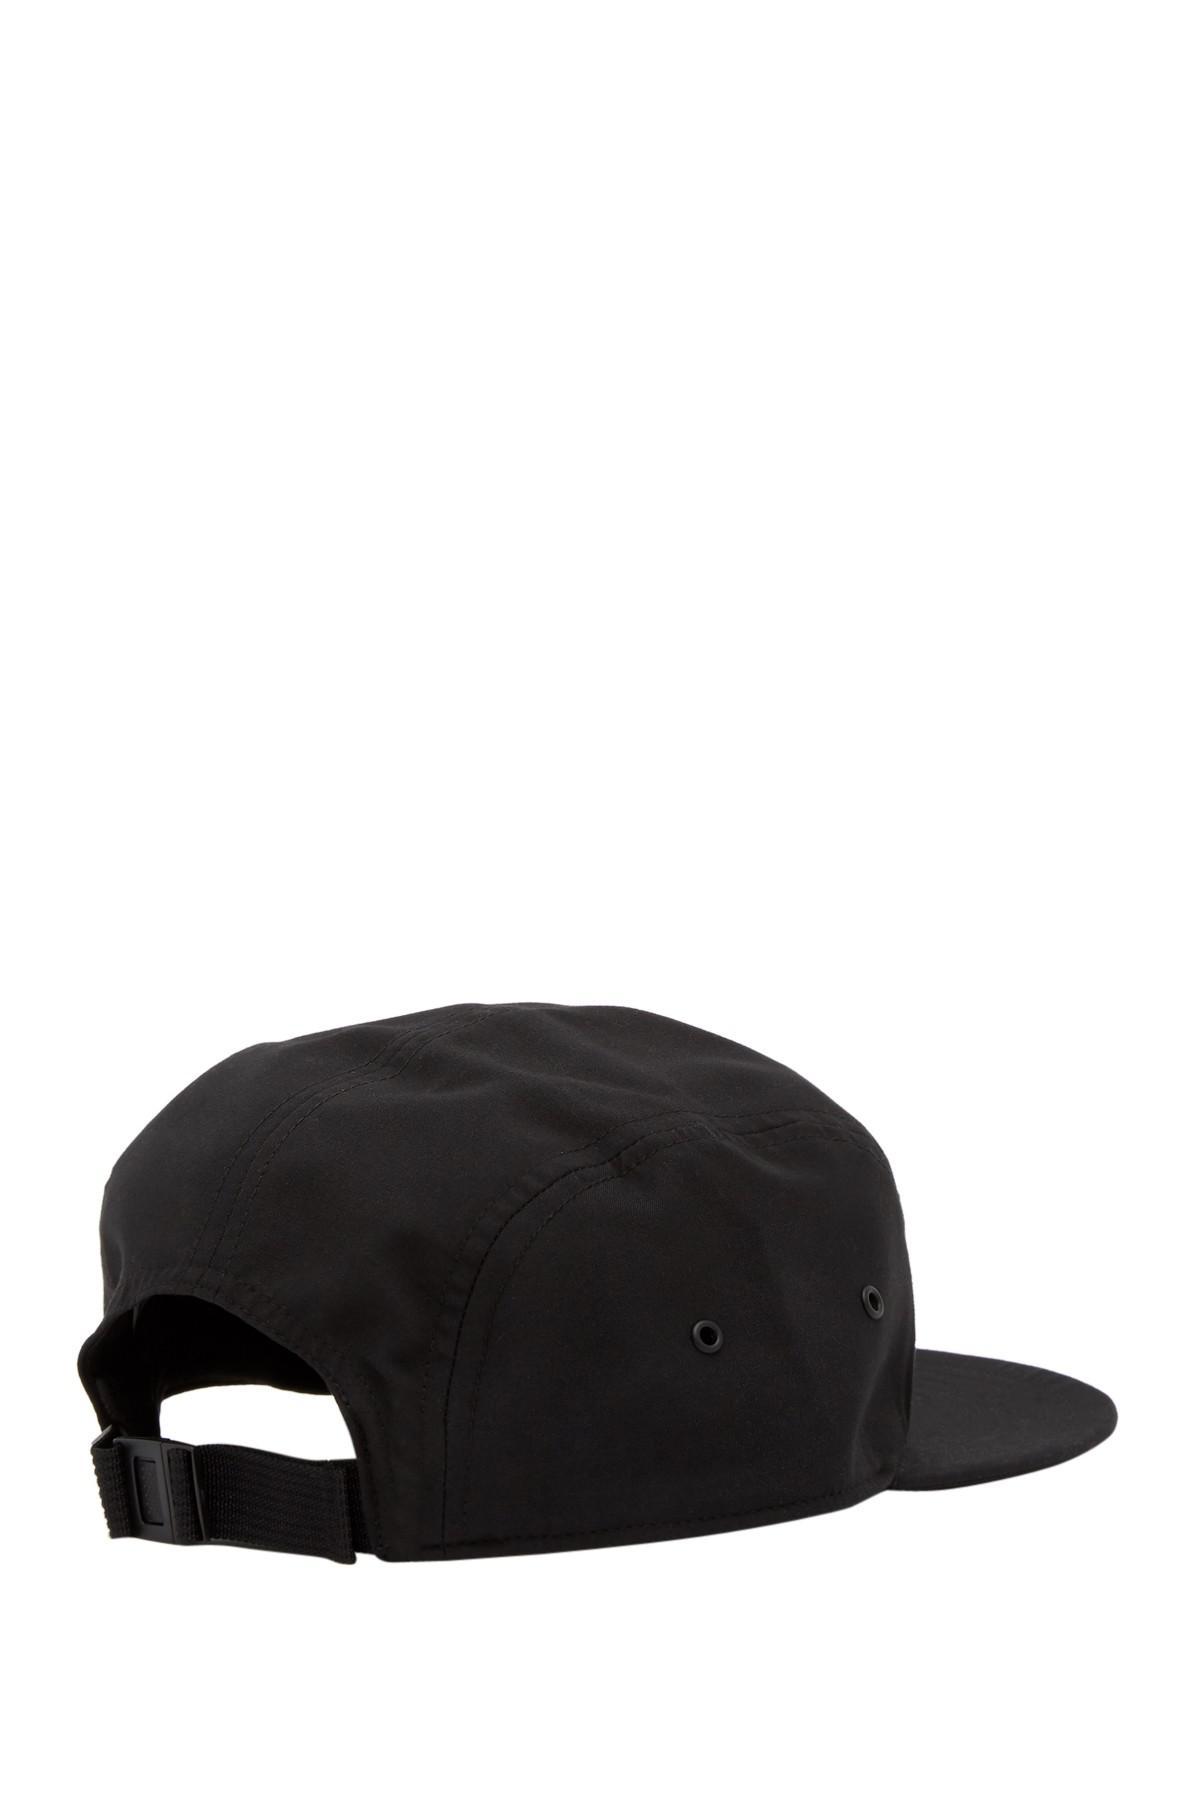 e73eaffda72 Lyst - PUMA Mainline Archive 5-panel Cap in Black for Men